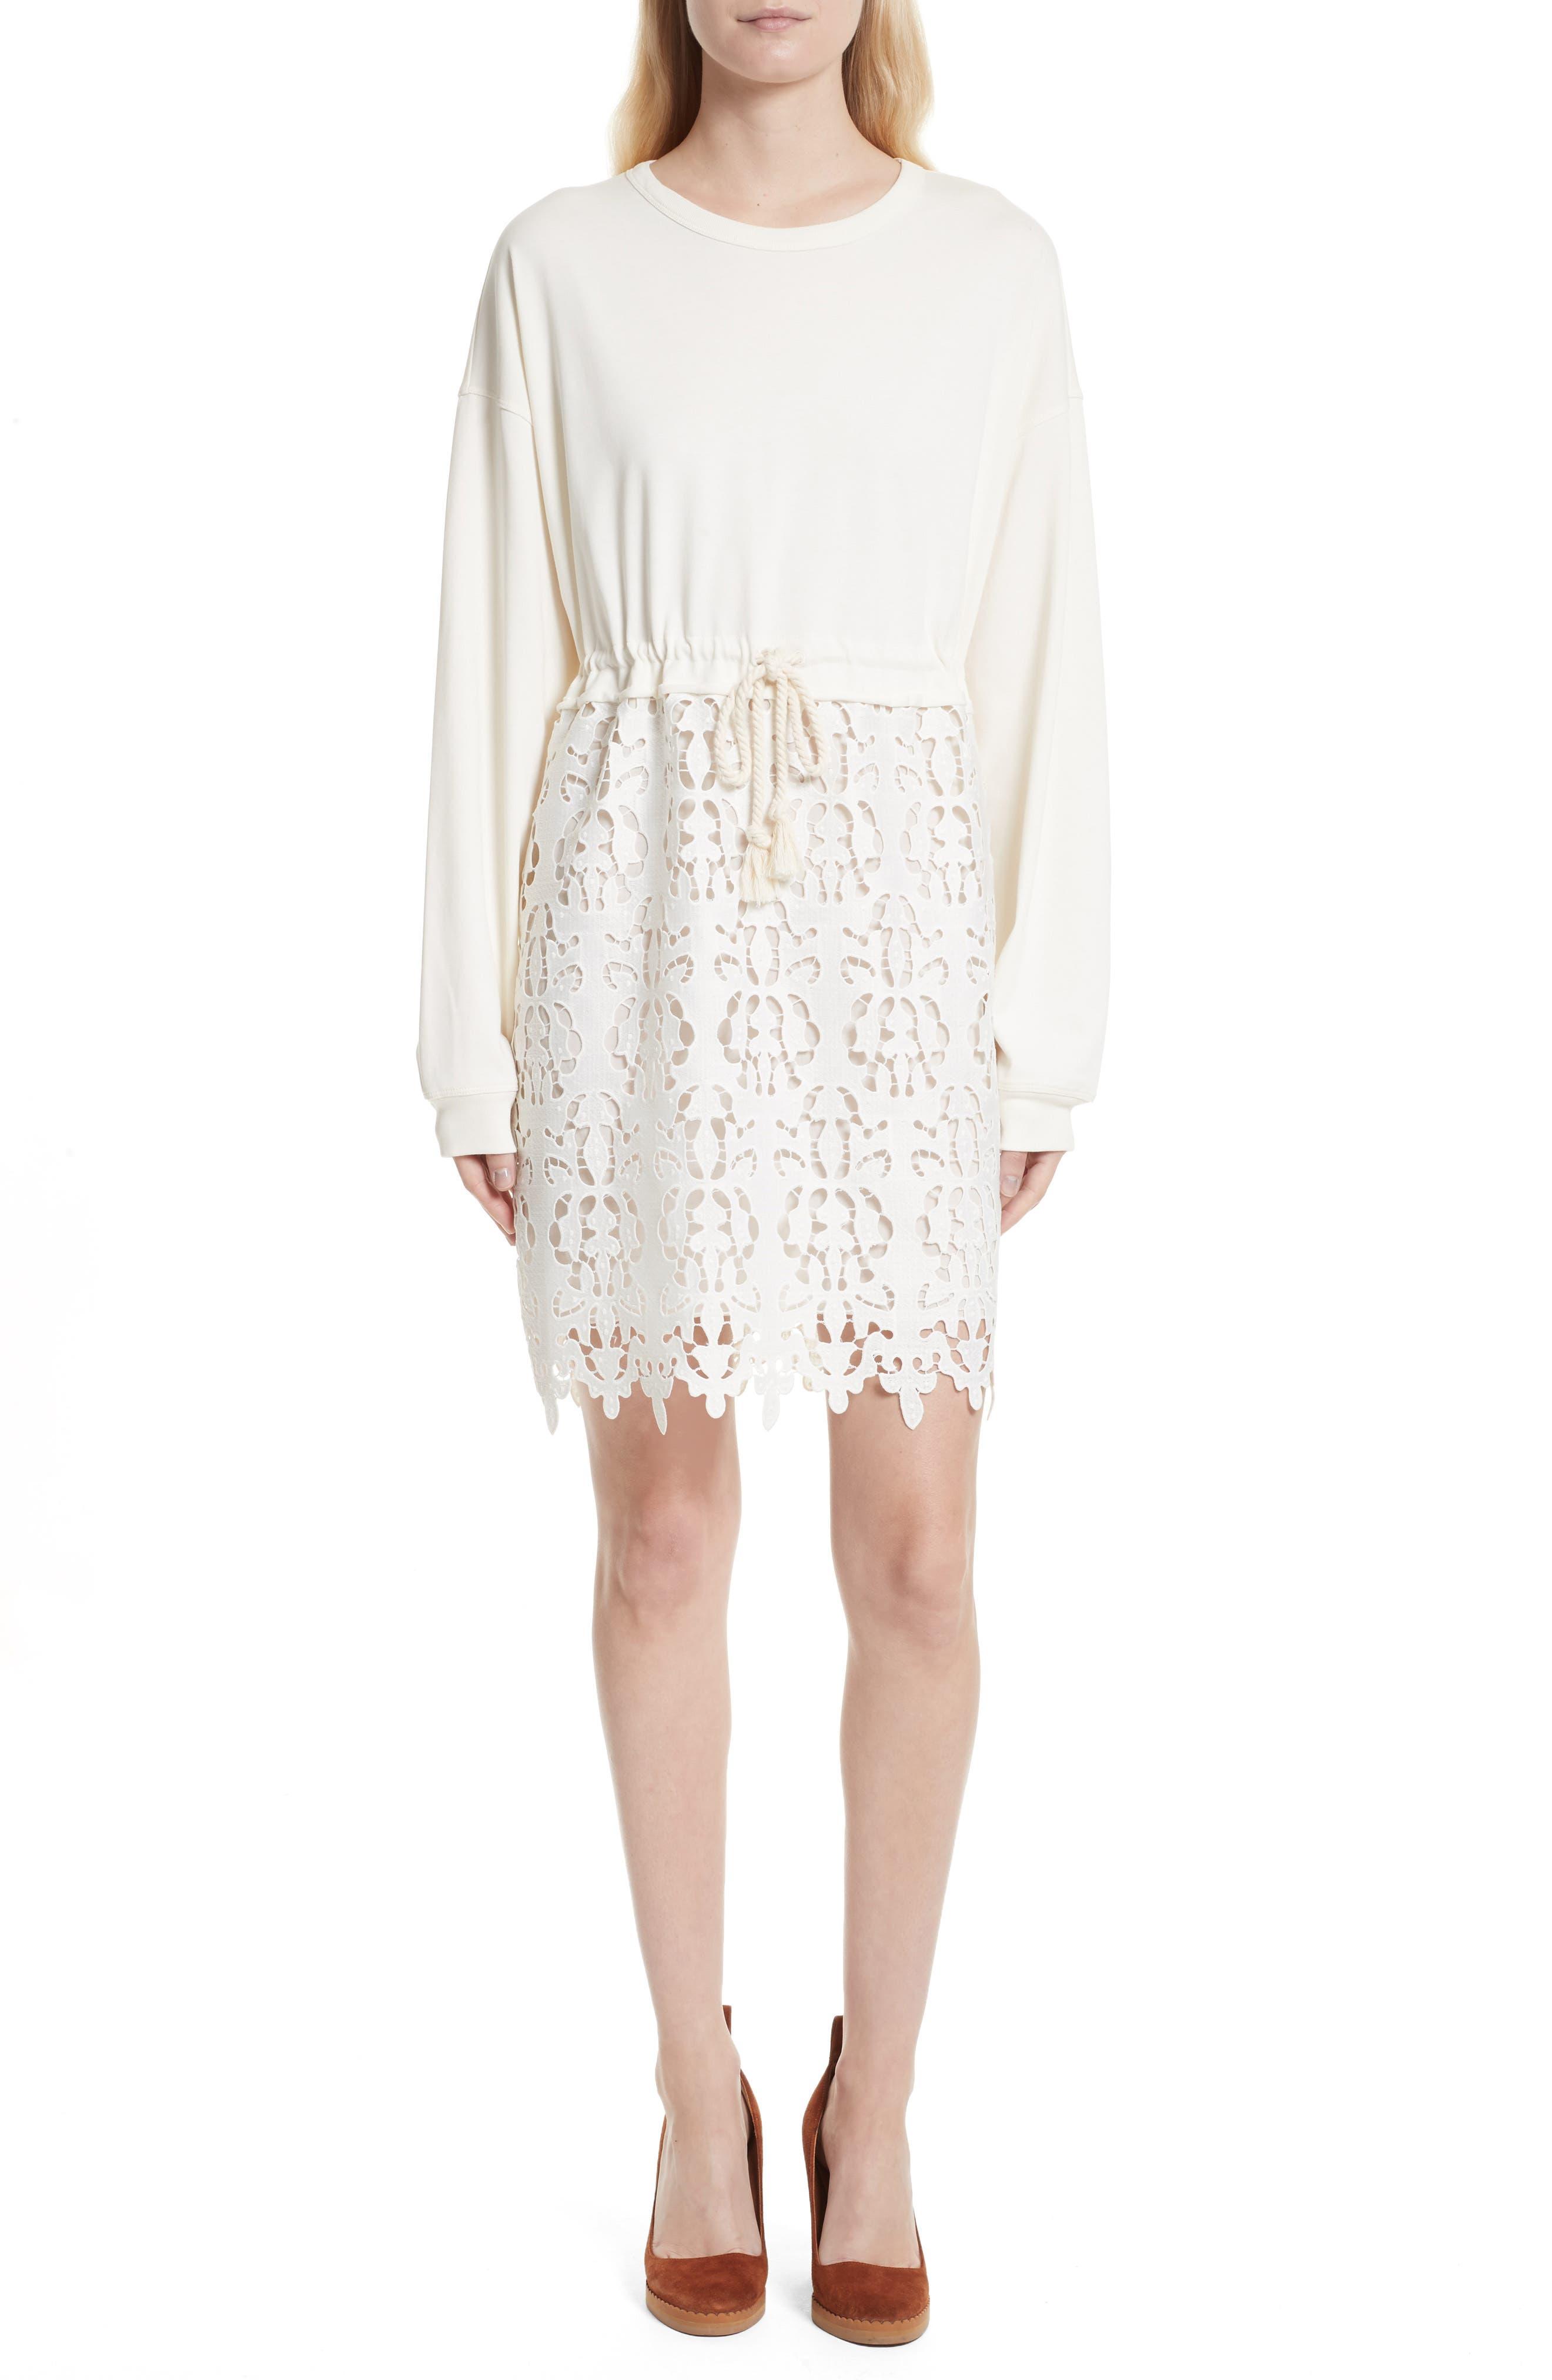 Main Image - See by Chloé Lace Skirt Sweatshirt Dress